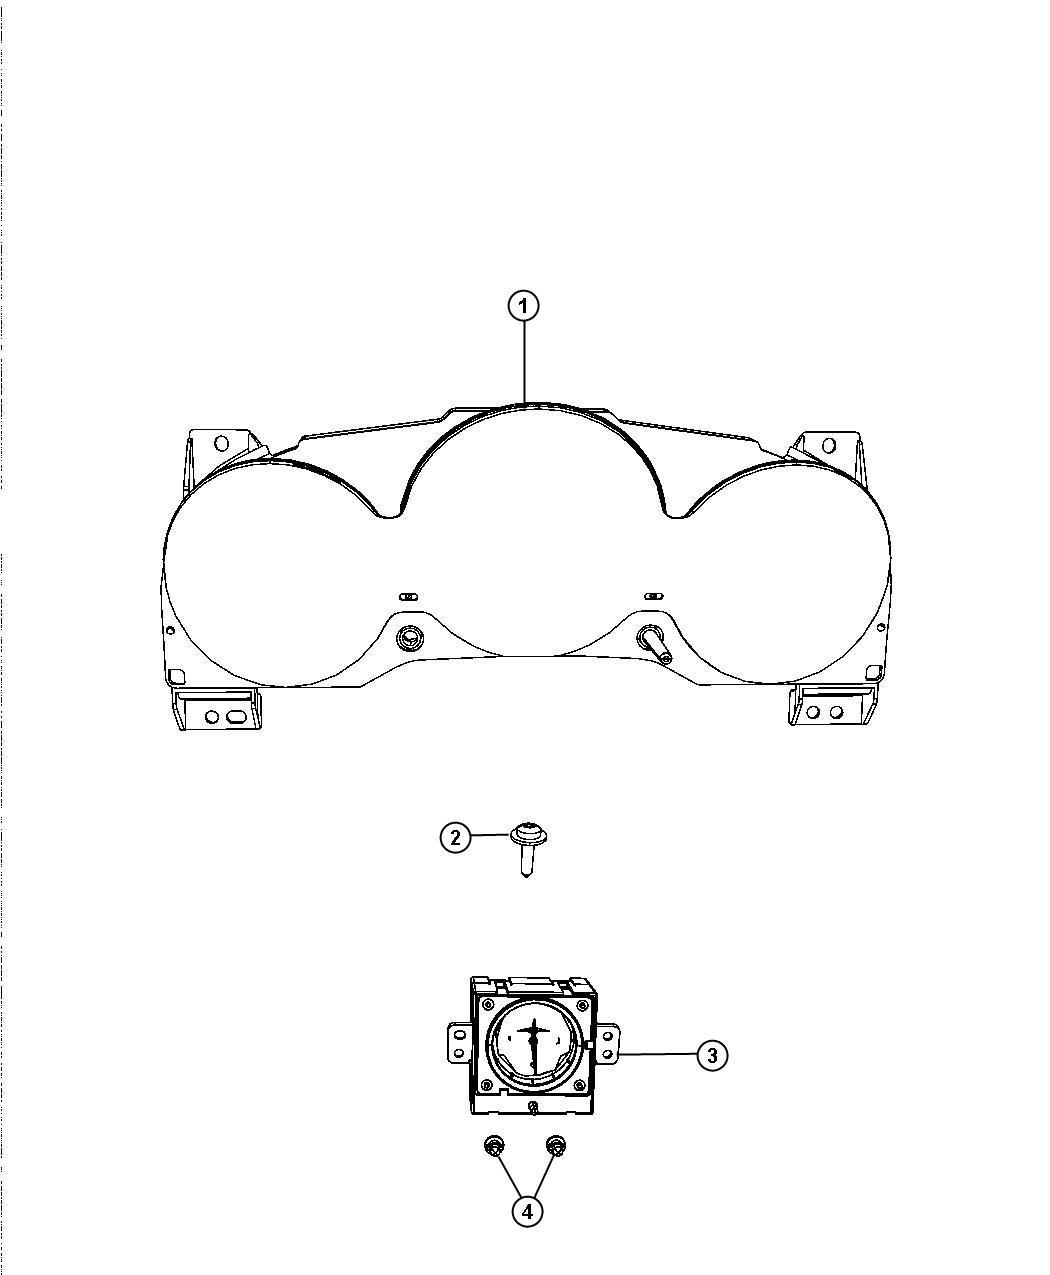 Dodge Avenger Cluster Instrument Panel 120 Mph Primary